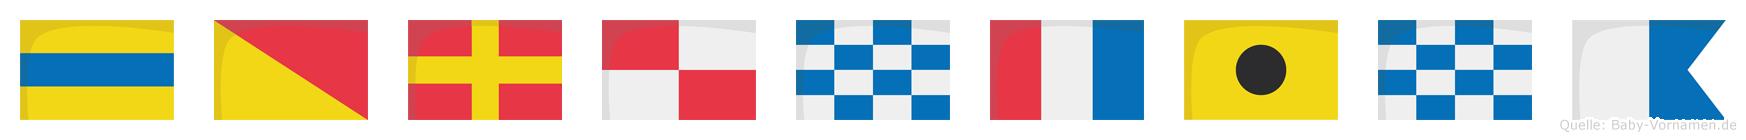 Doruntina im Flaggenalphabet